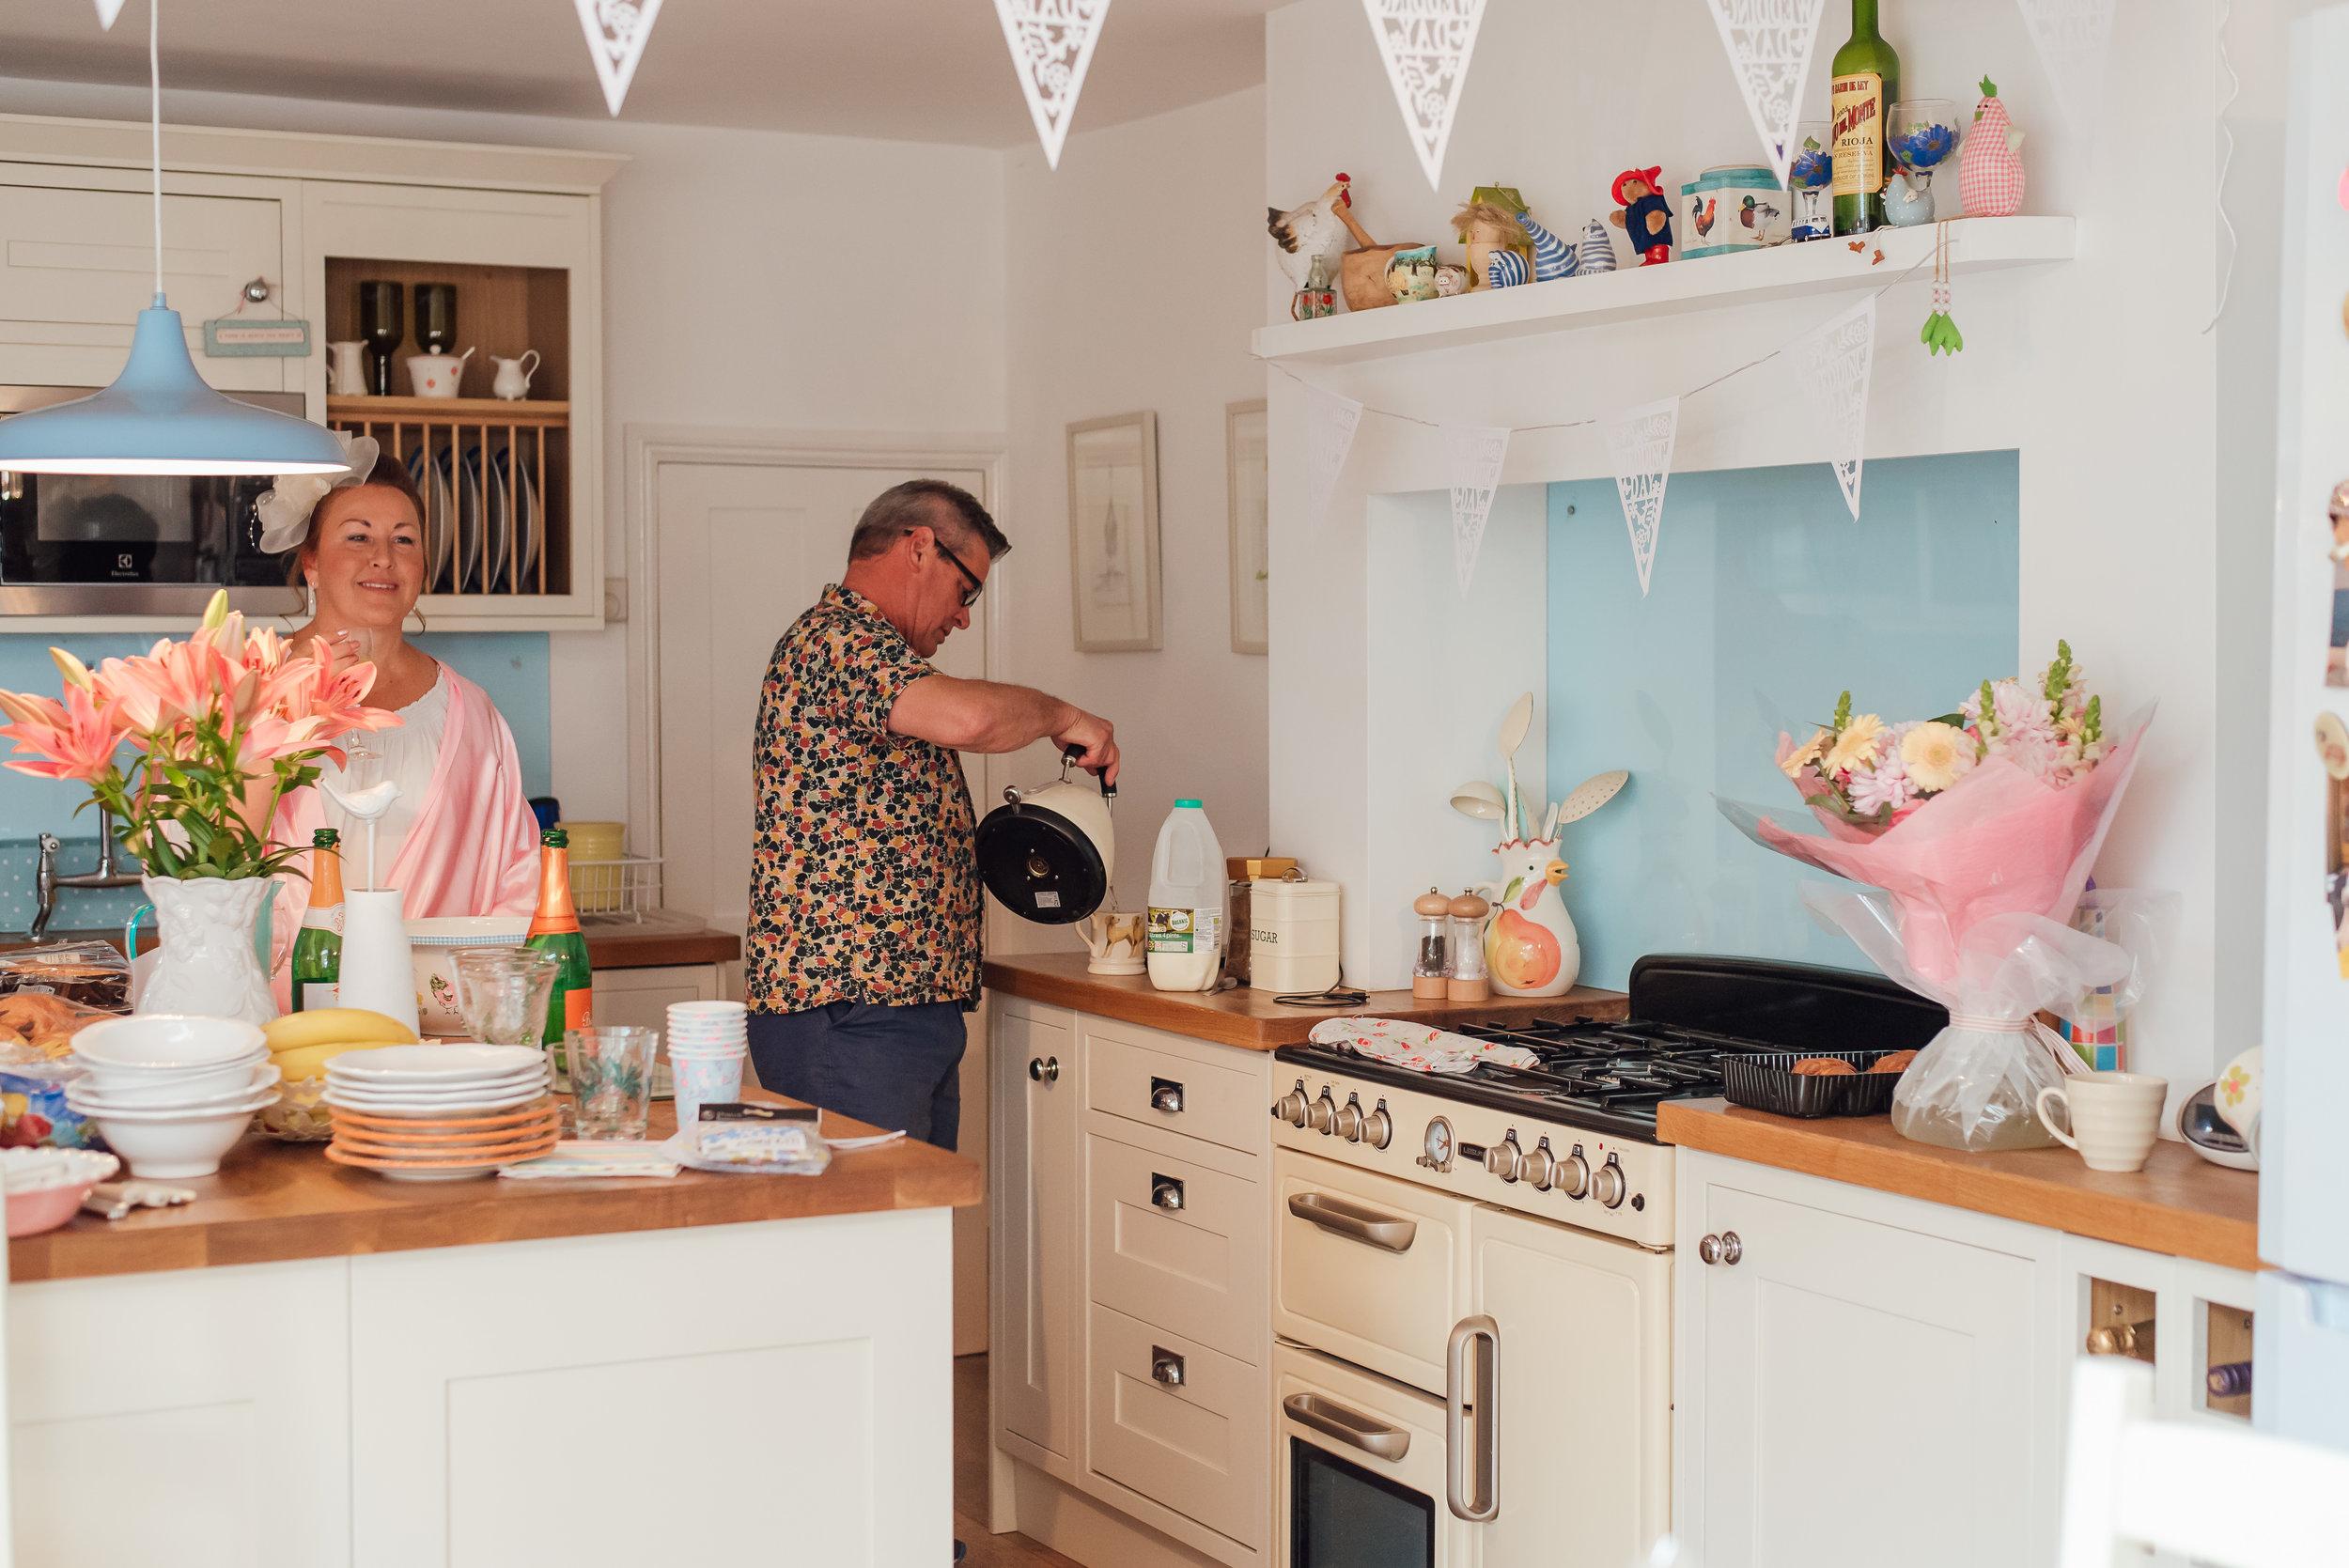 Hampshire-wedding-photographer : Amy-james-photography : Surrey-wedding-photographer : Fleet-wedding-photographer : Worplesdon-Place-Wedding : Worplesdon-place-wedding-photographer : documentary-wedding-photographer-hampshire-surrey-berkshire-262.jpg